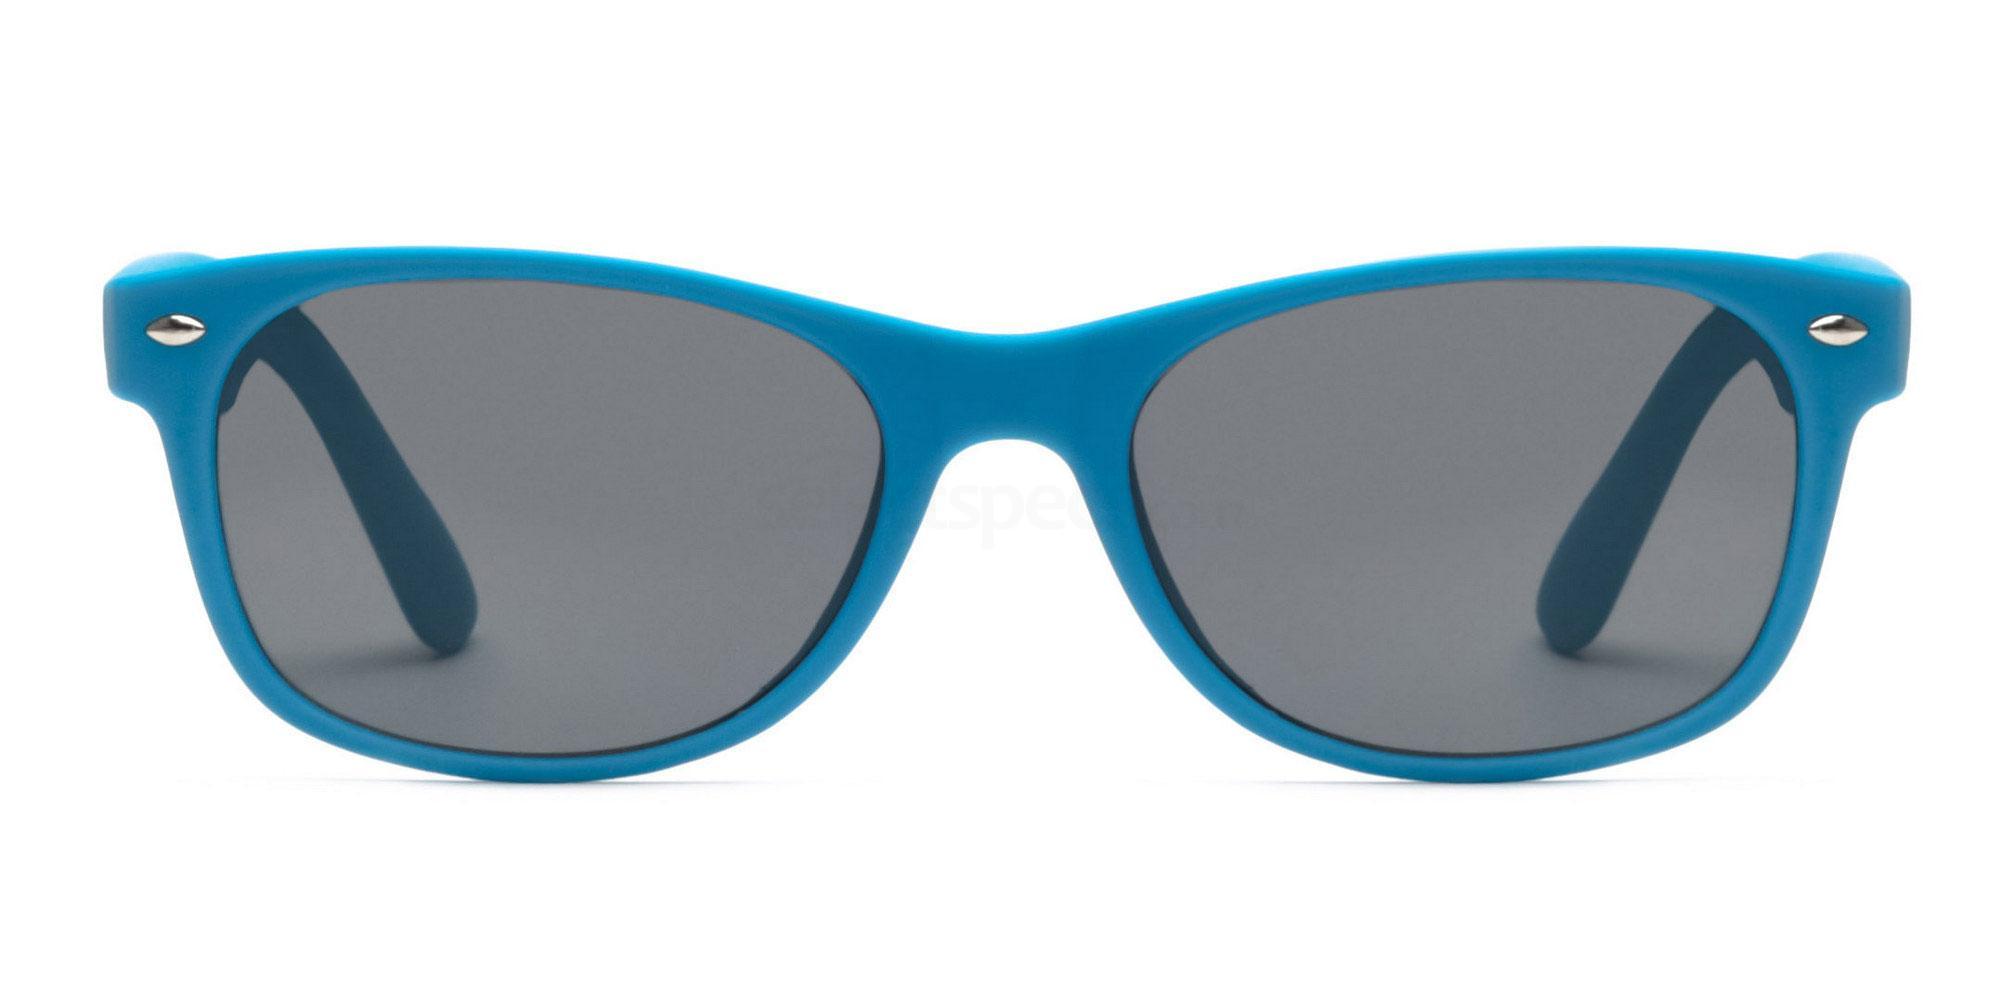 Light Blue S8122 - Light Blue (Sunglasses) Sunglasses, Savannah